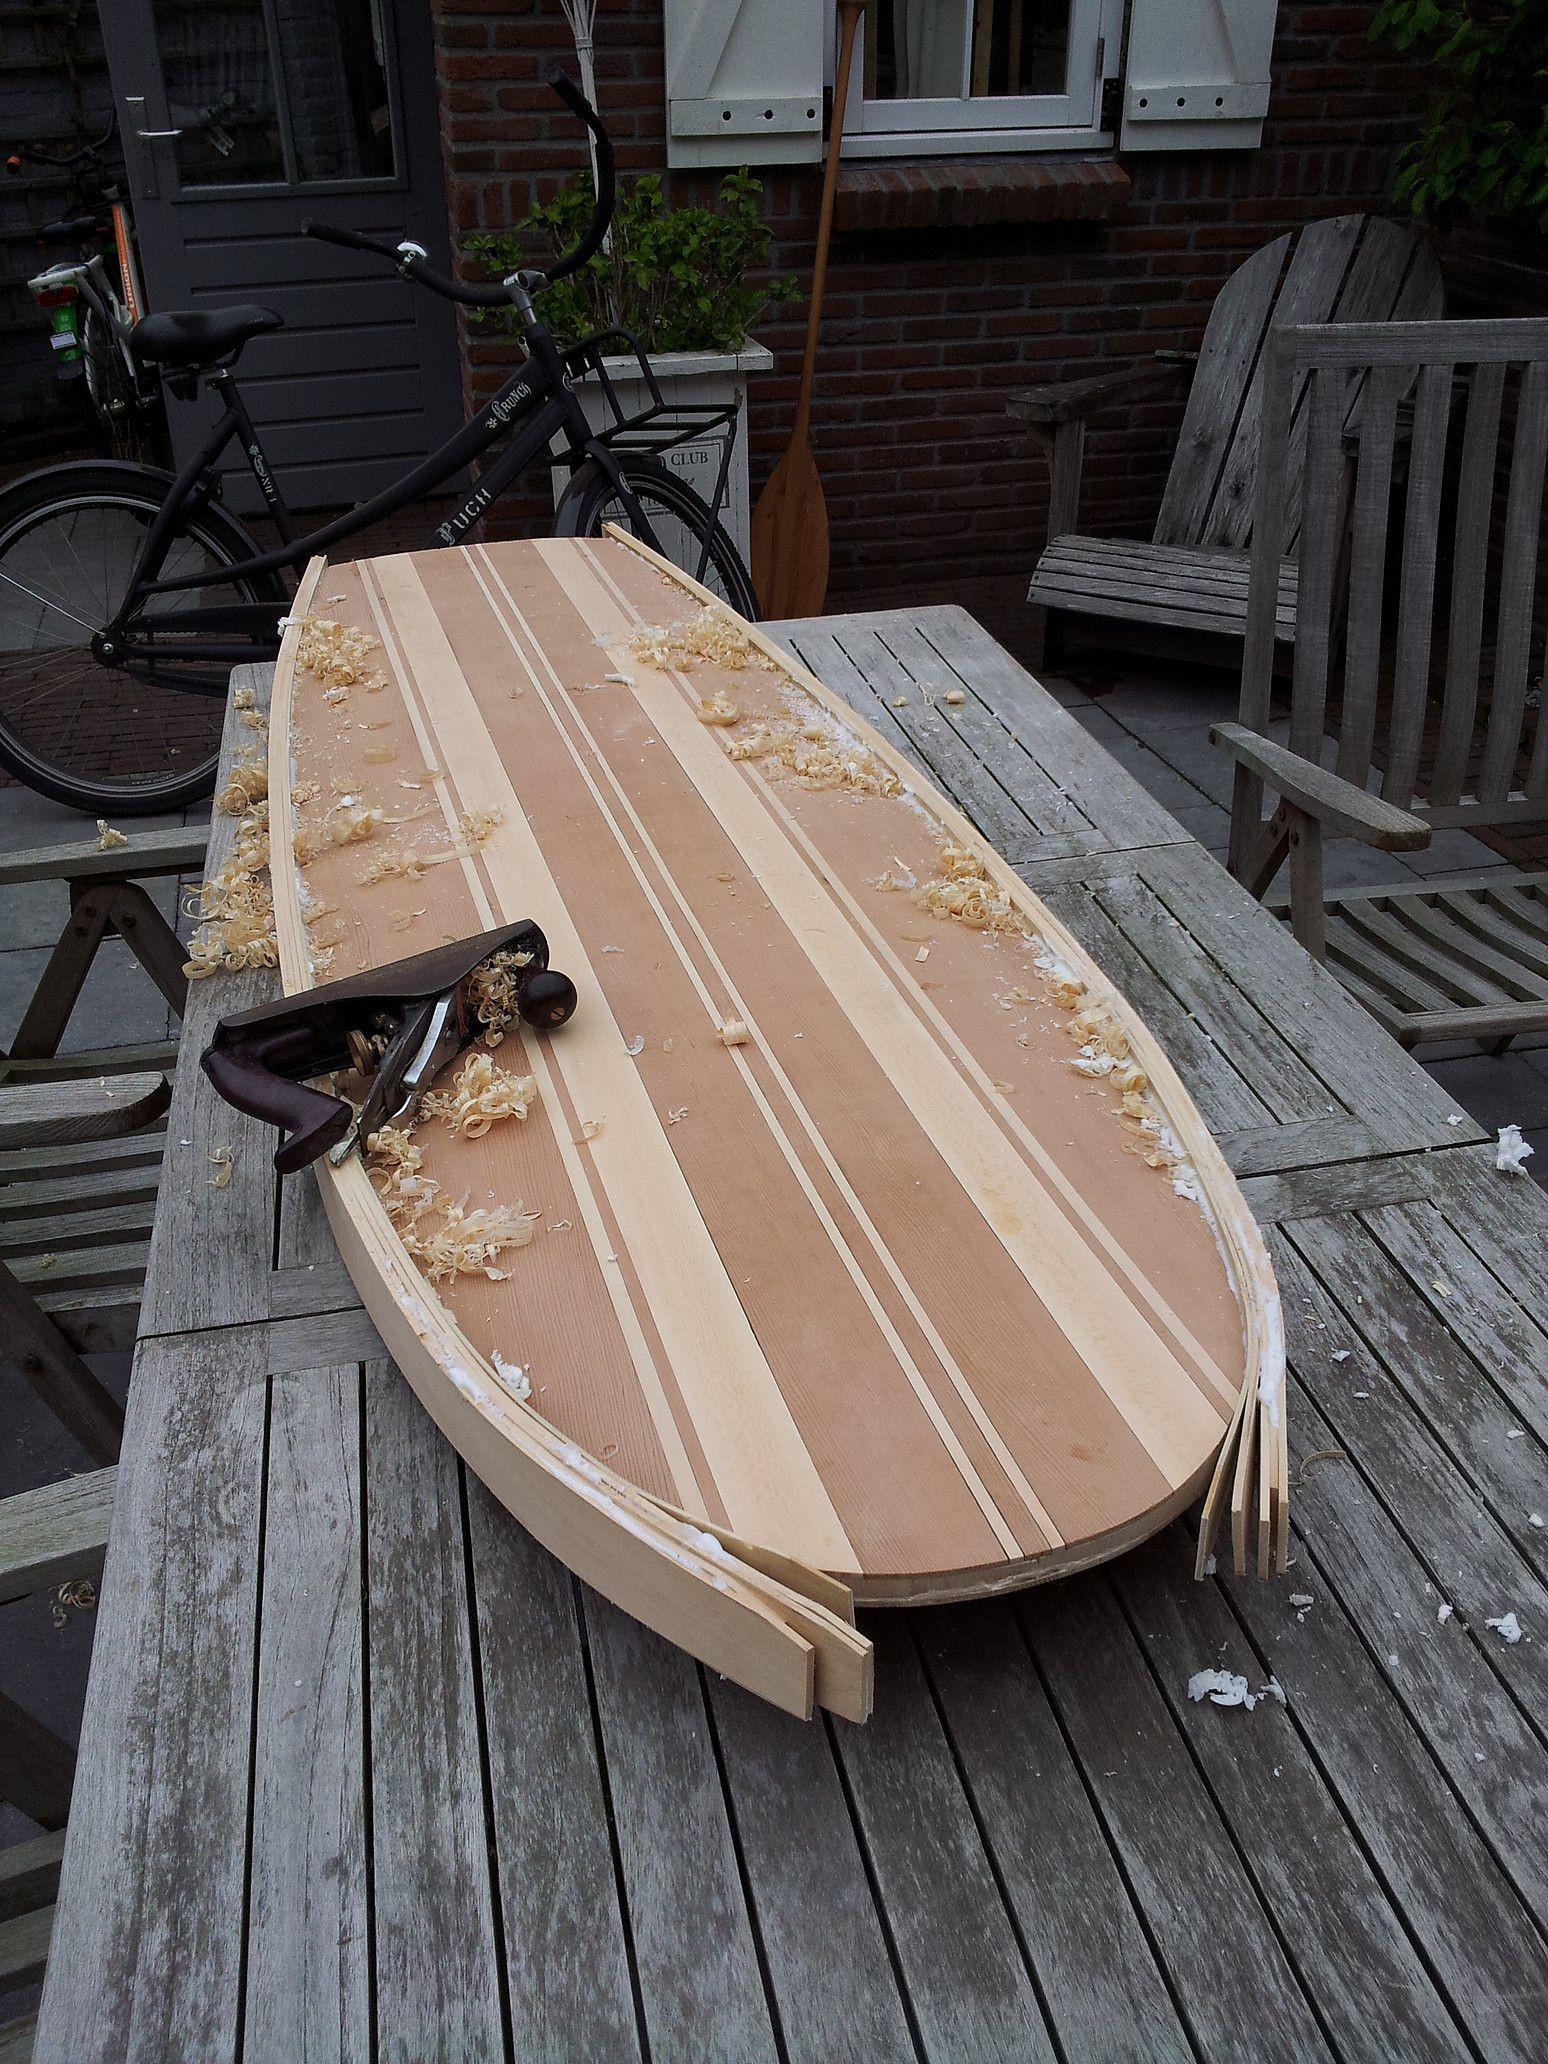 DIY Wood Surfboard  an overview of a wooden surfboard being built from start